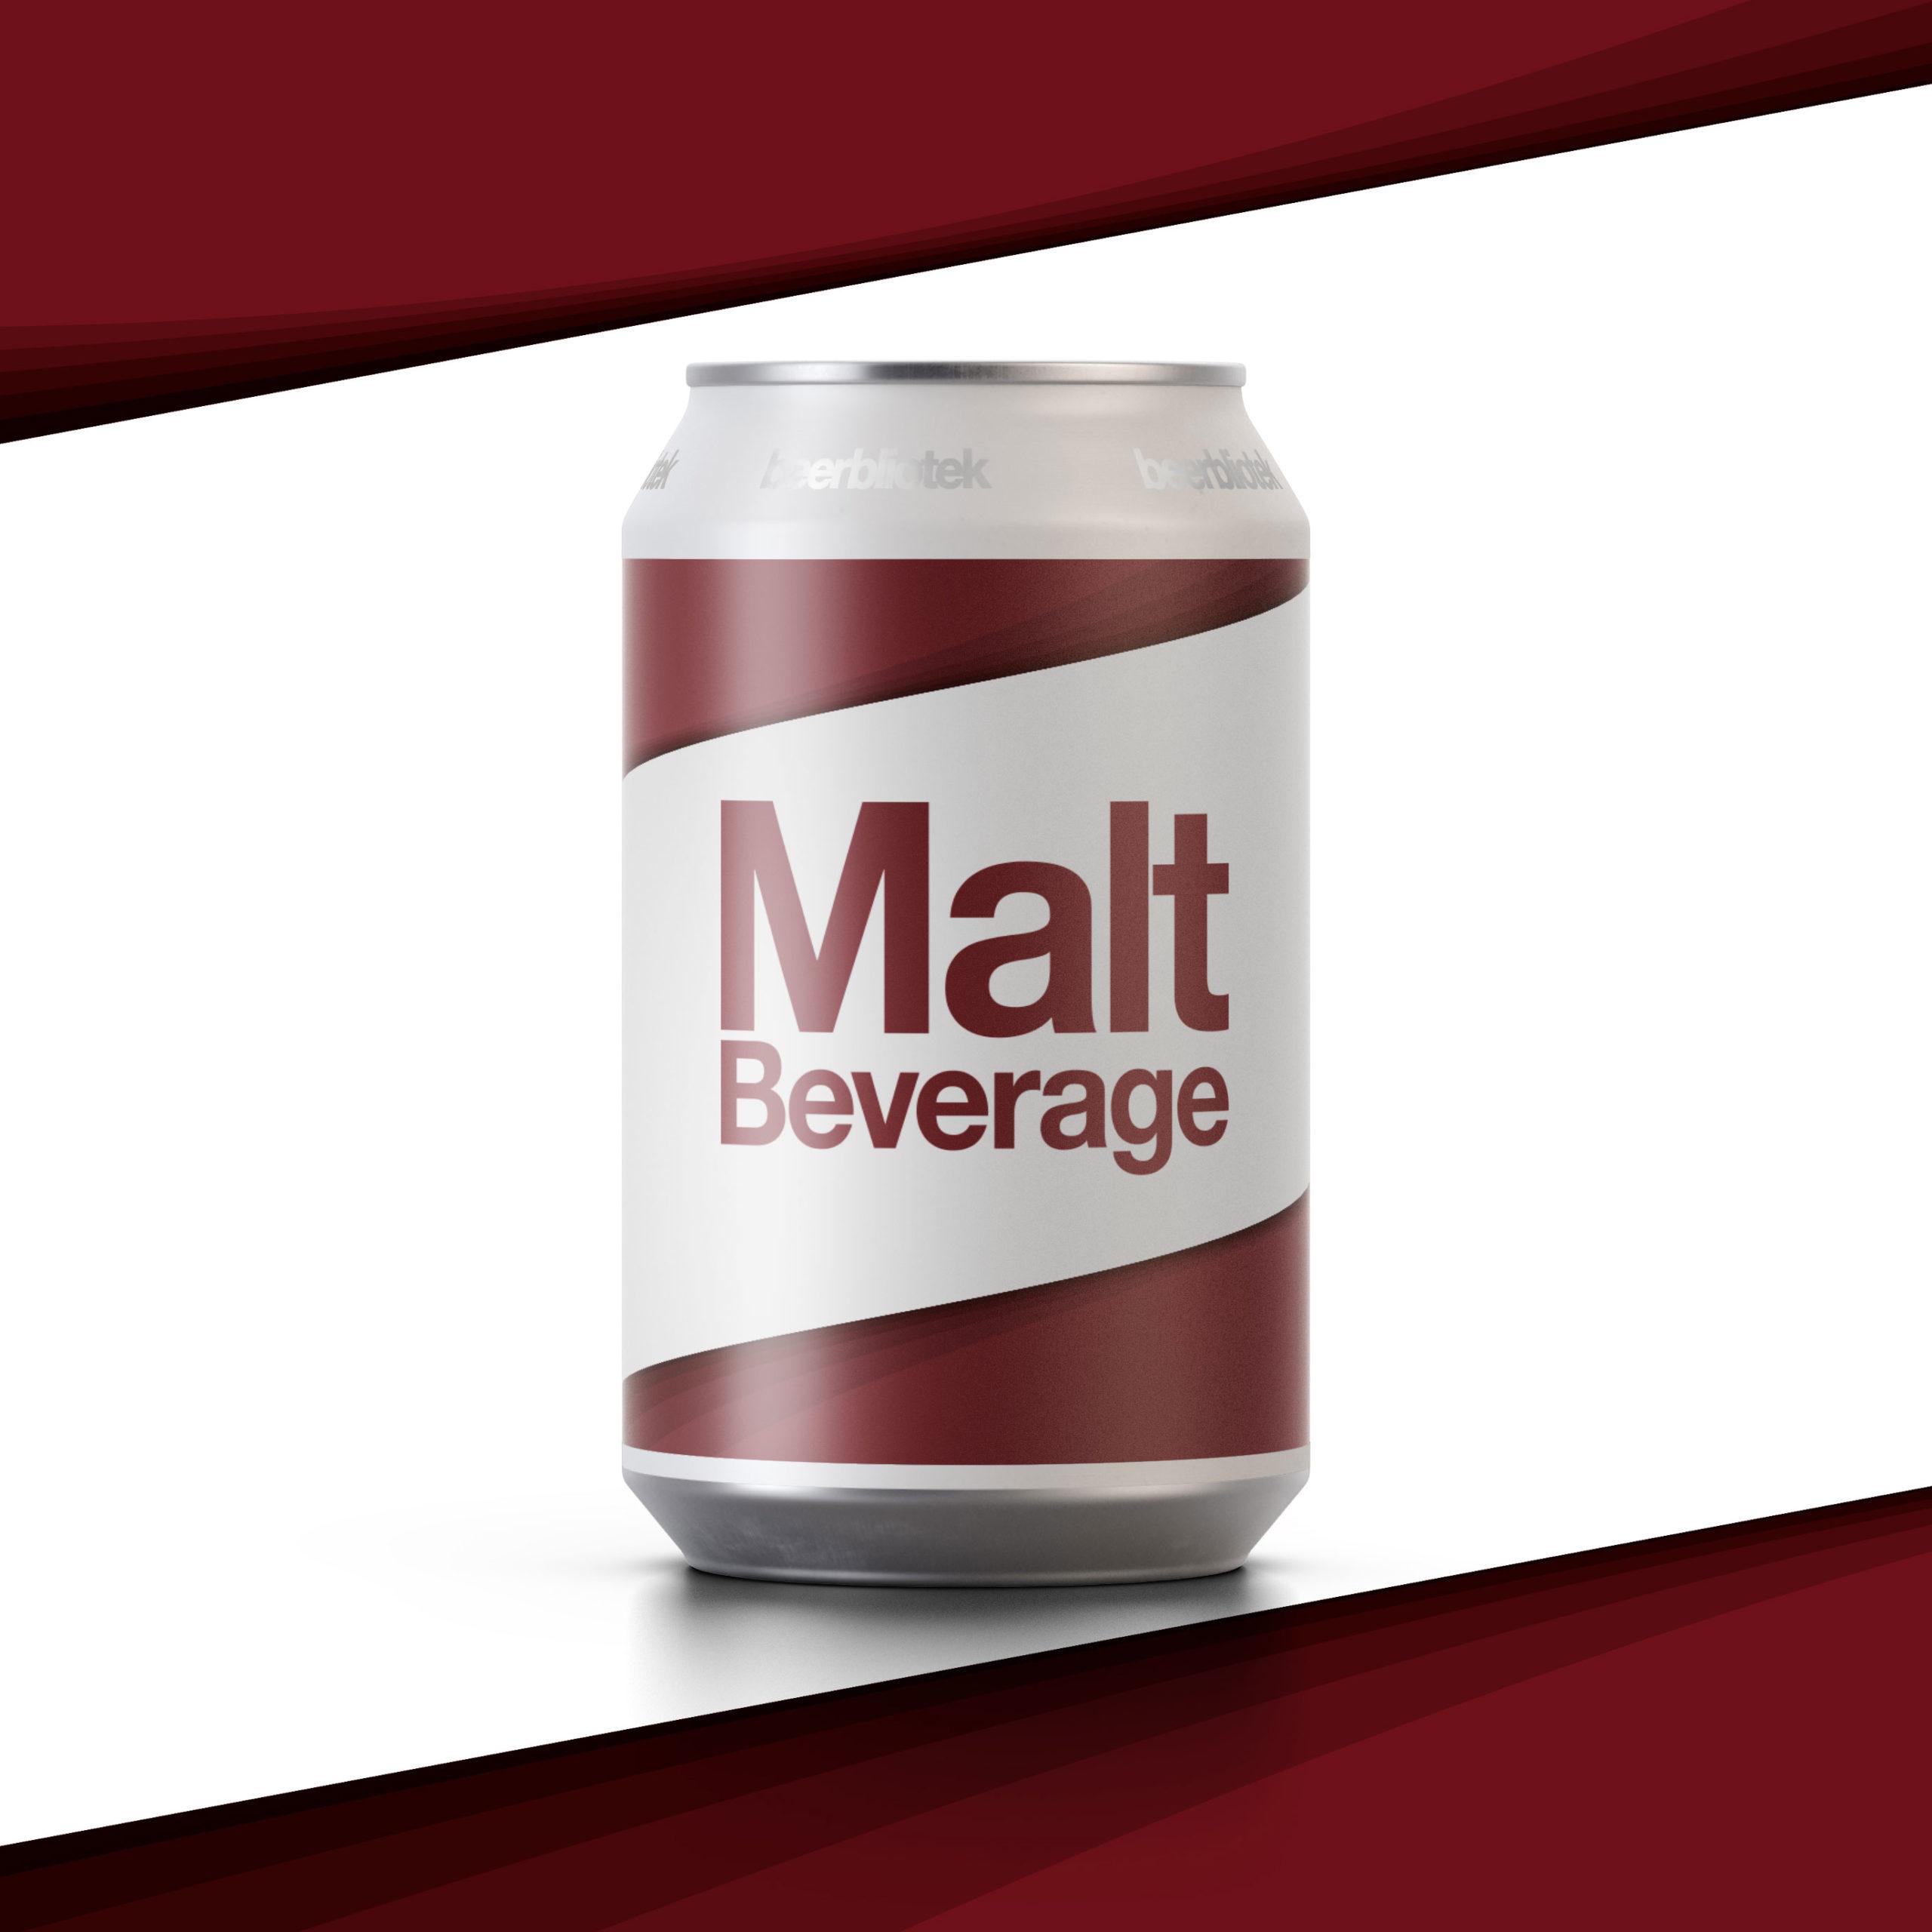 A marketing can packshot of Malt Beverage, an Amber Lager, brewed by Swedish Craft Brewery Beerbliotek.